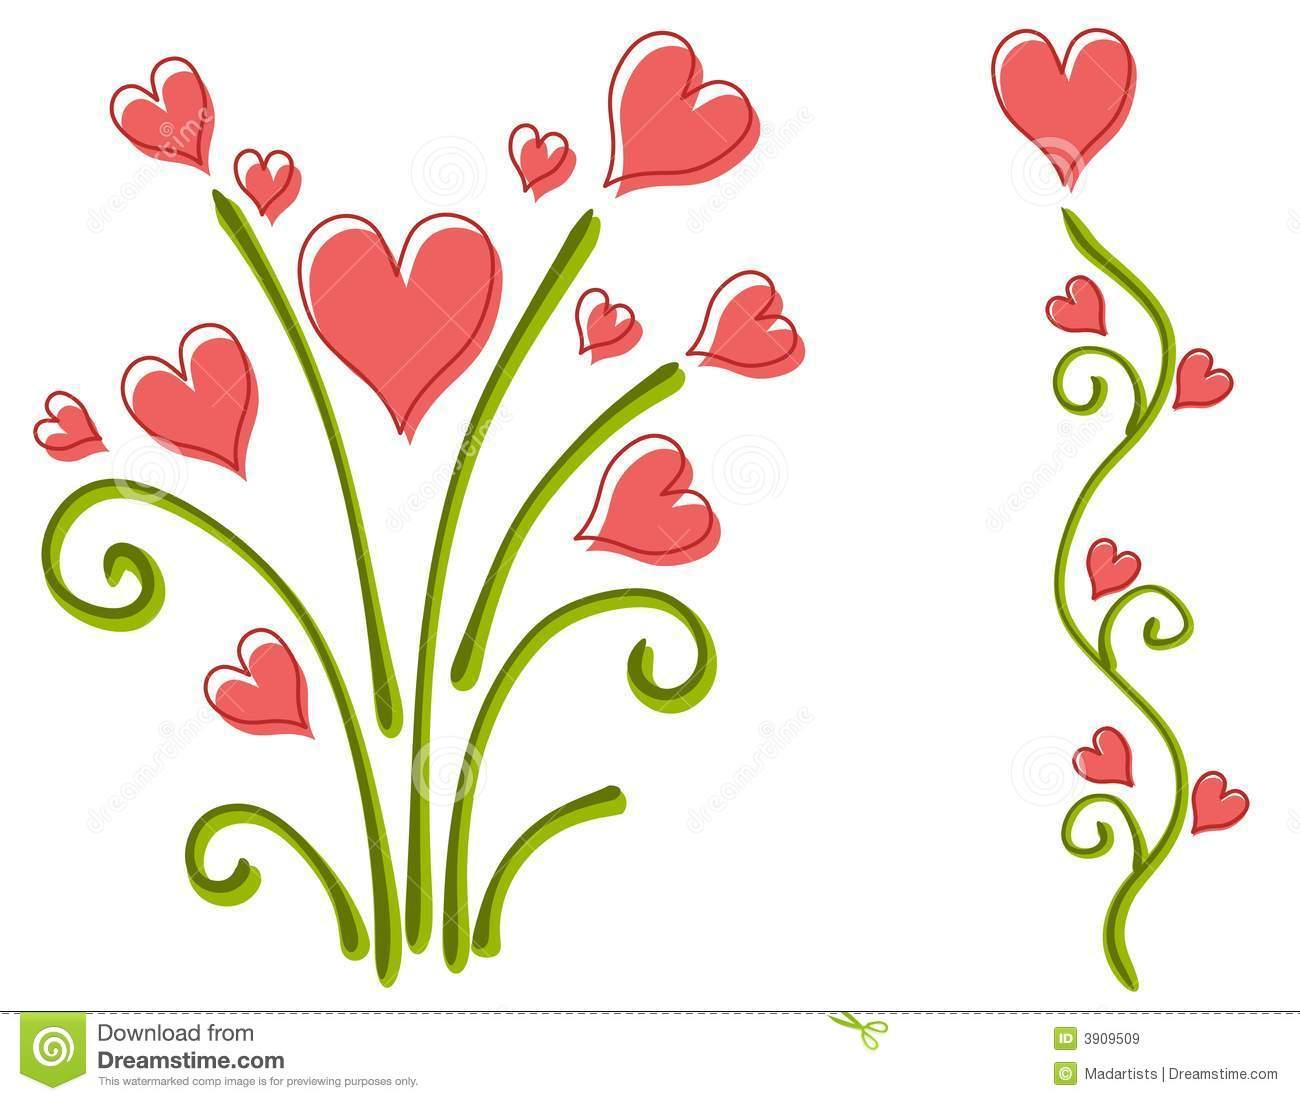 Clipart hearts plant. Heart portal